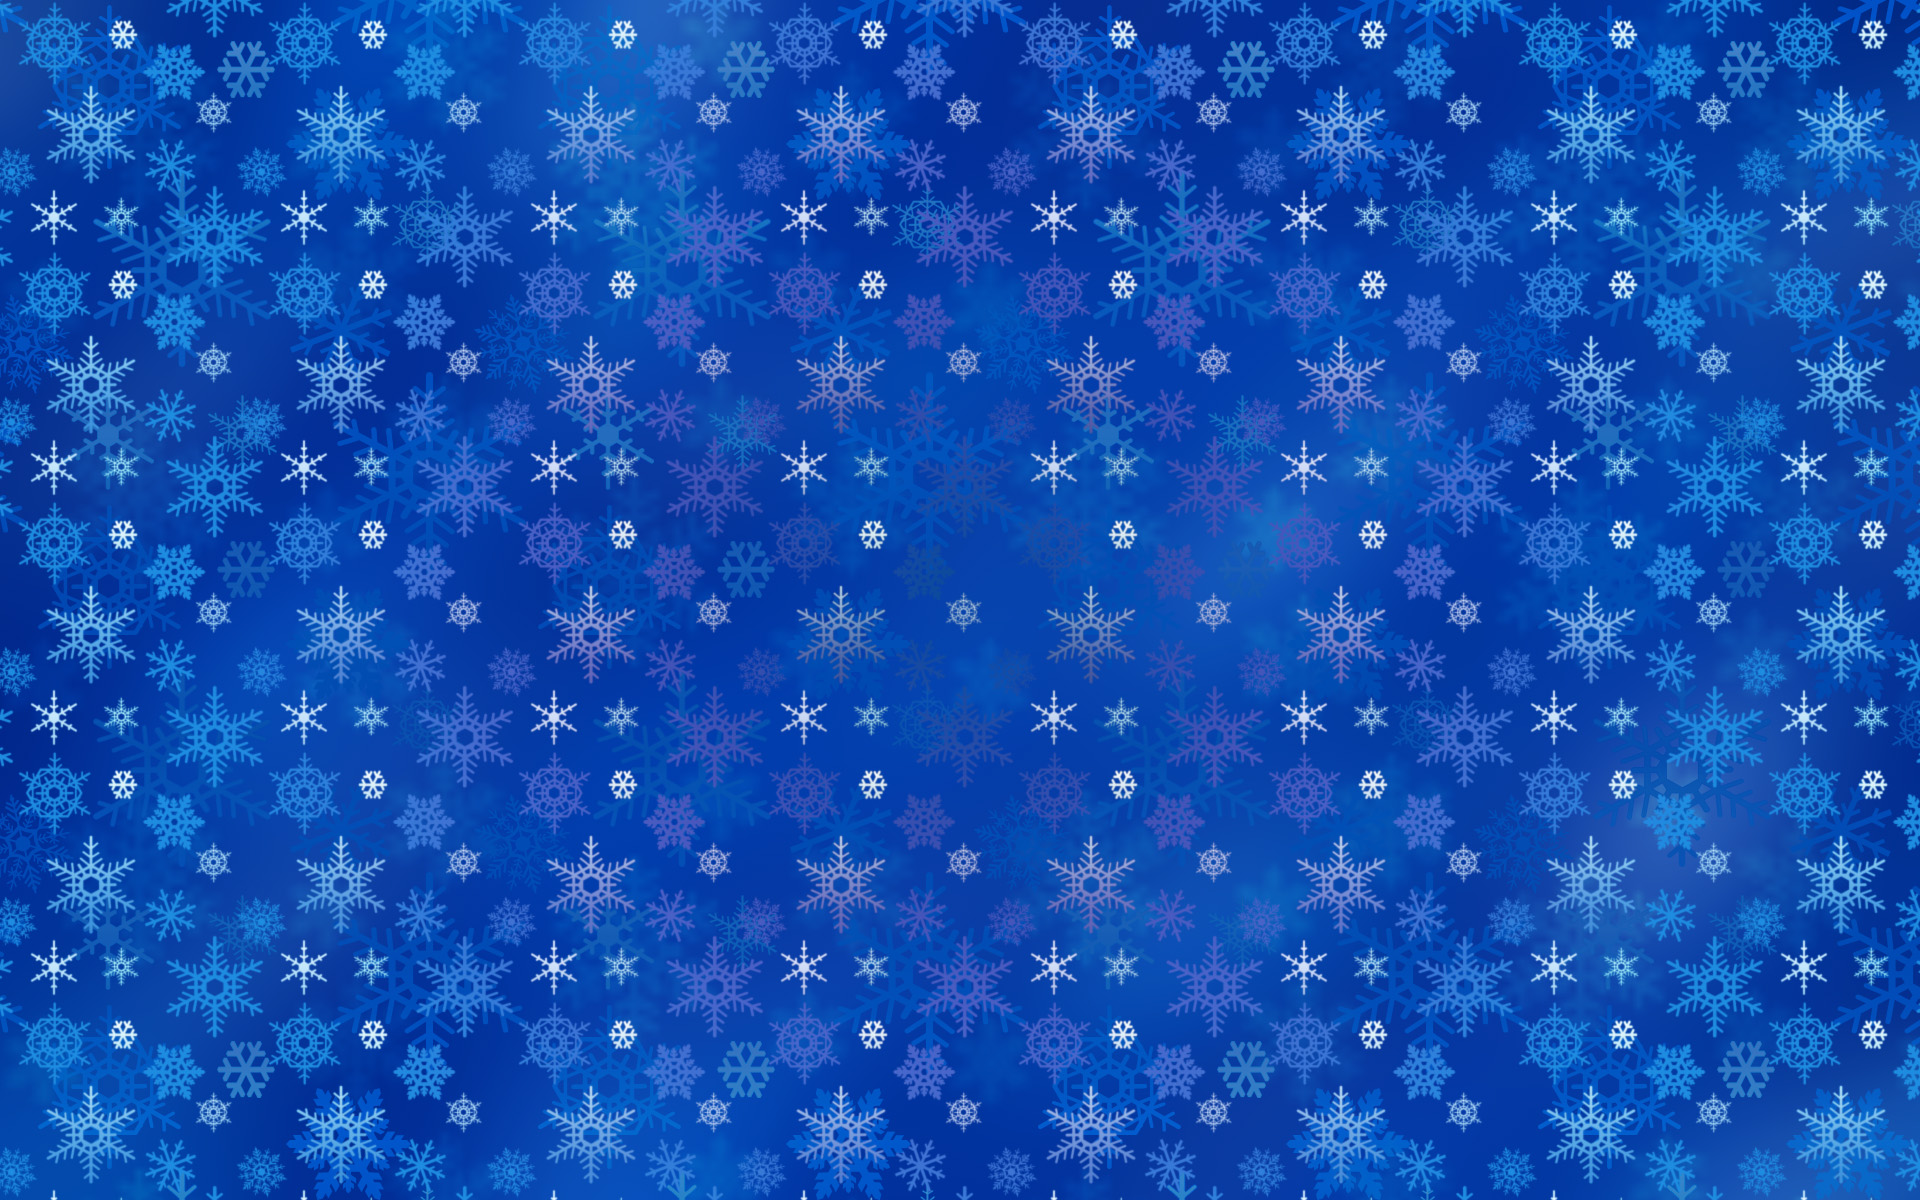 Зимний фон для фотошопа - 01e